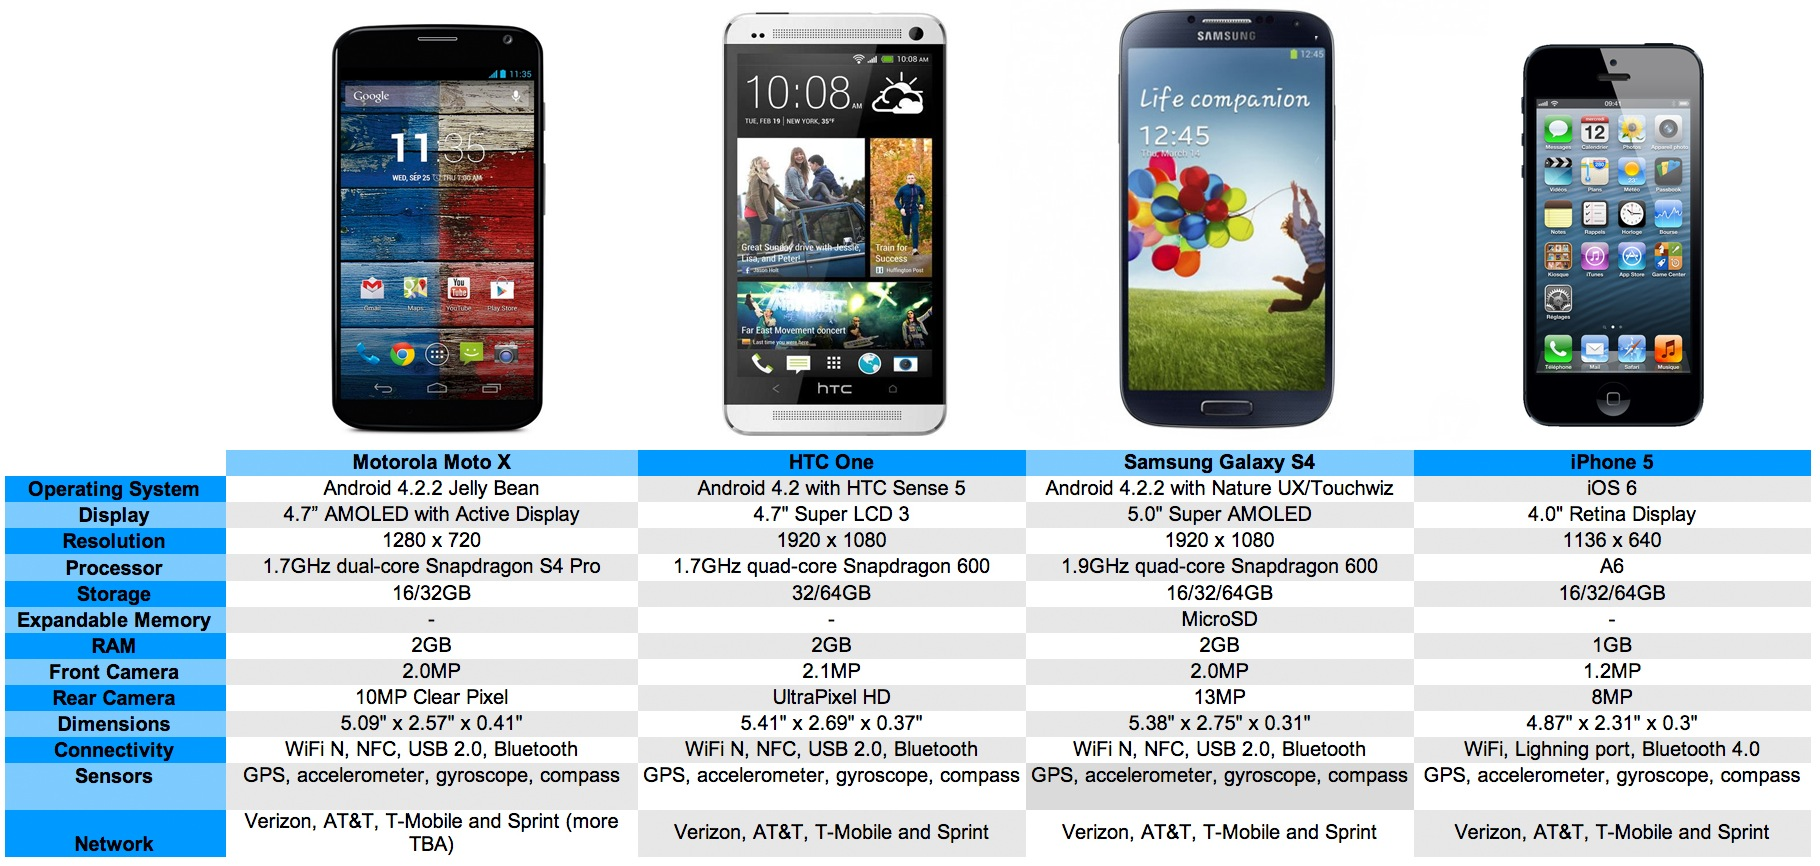 Galaxy S4 Vs Htc One X Moto X vs HTC One vs G...